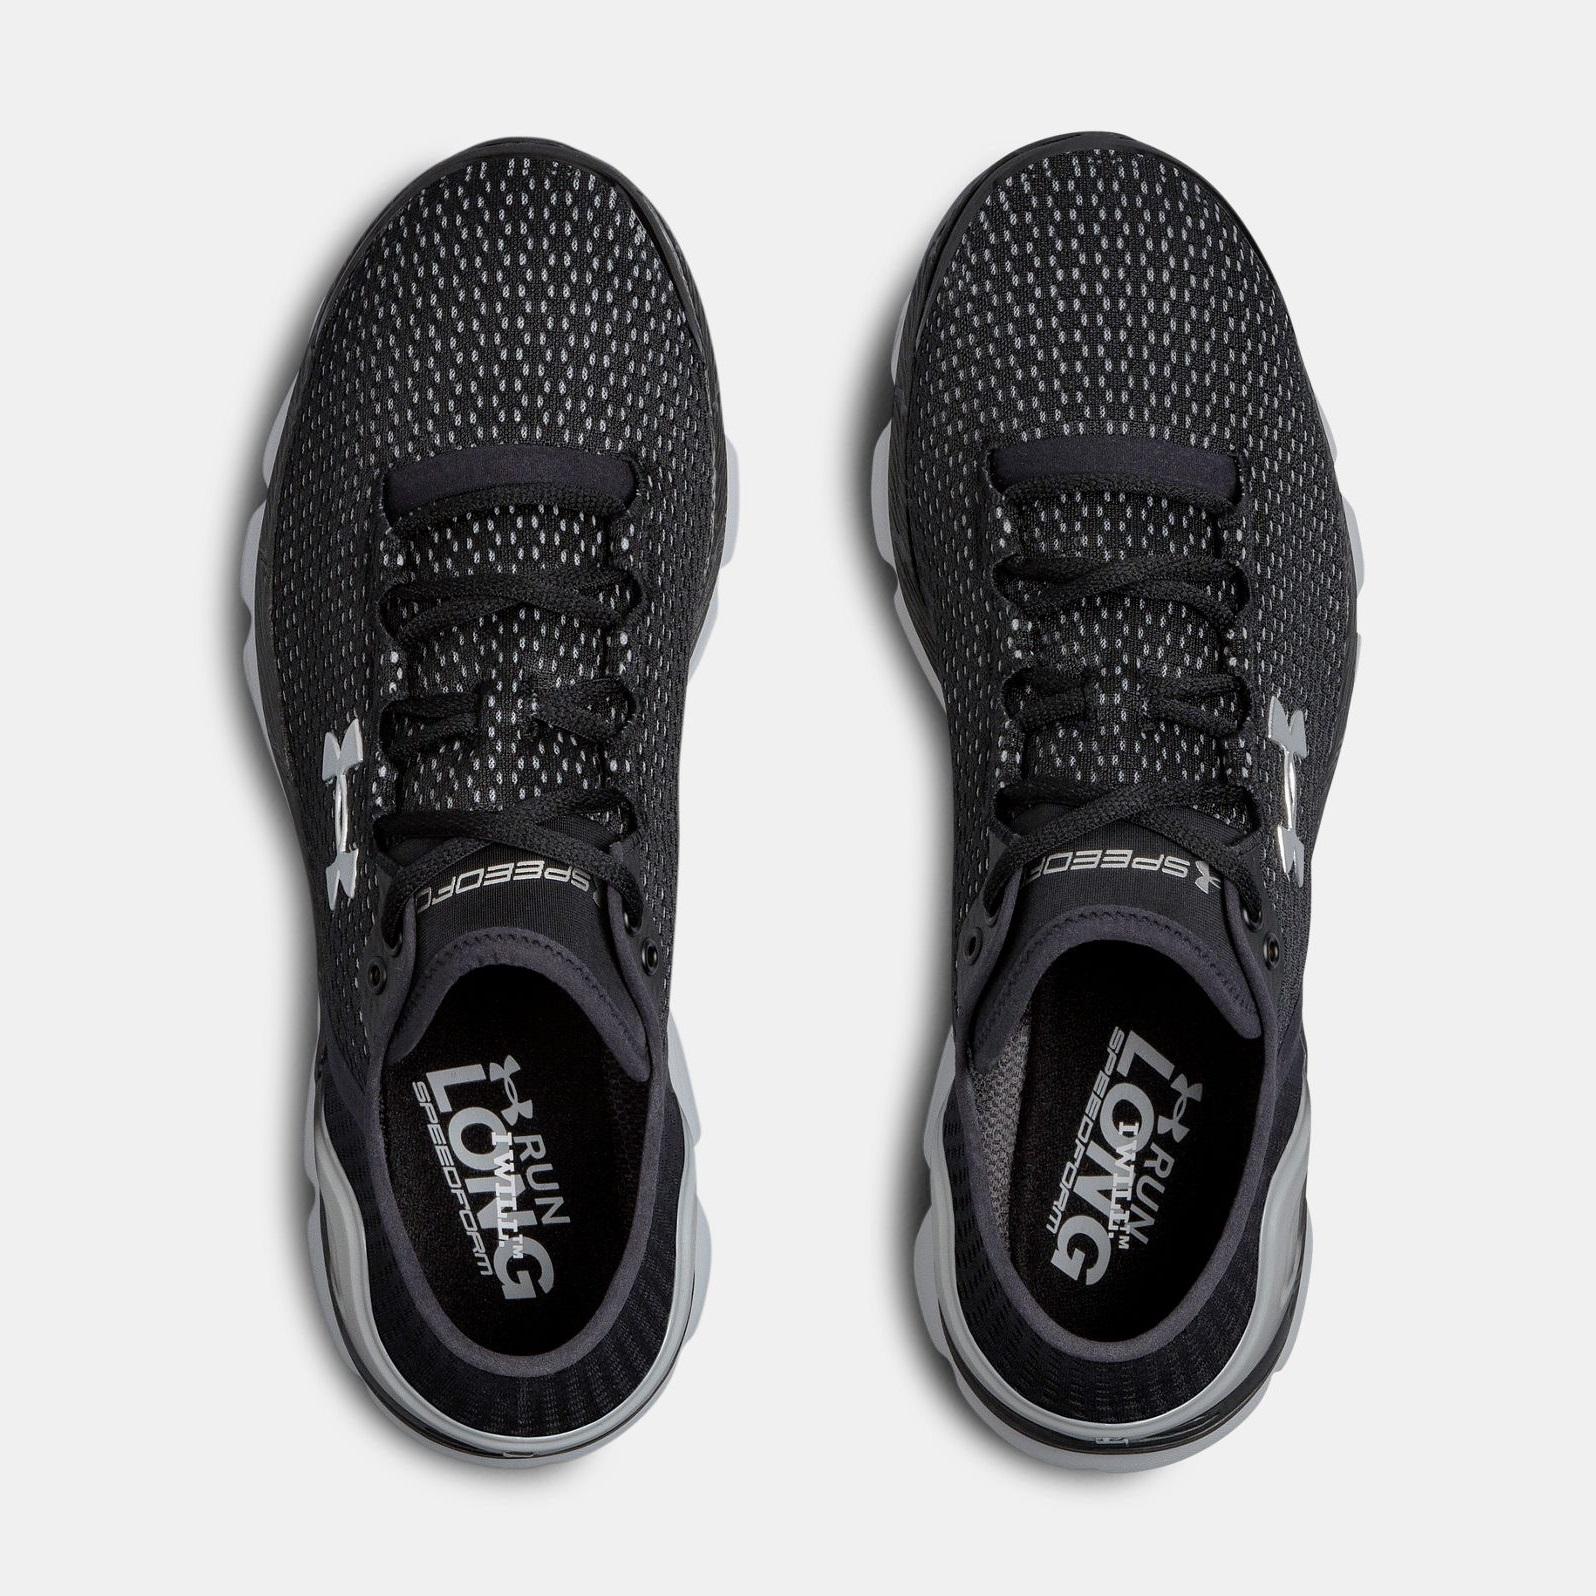 Shoes | Under armour SpeedForm Intake 2